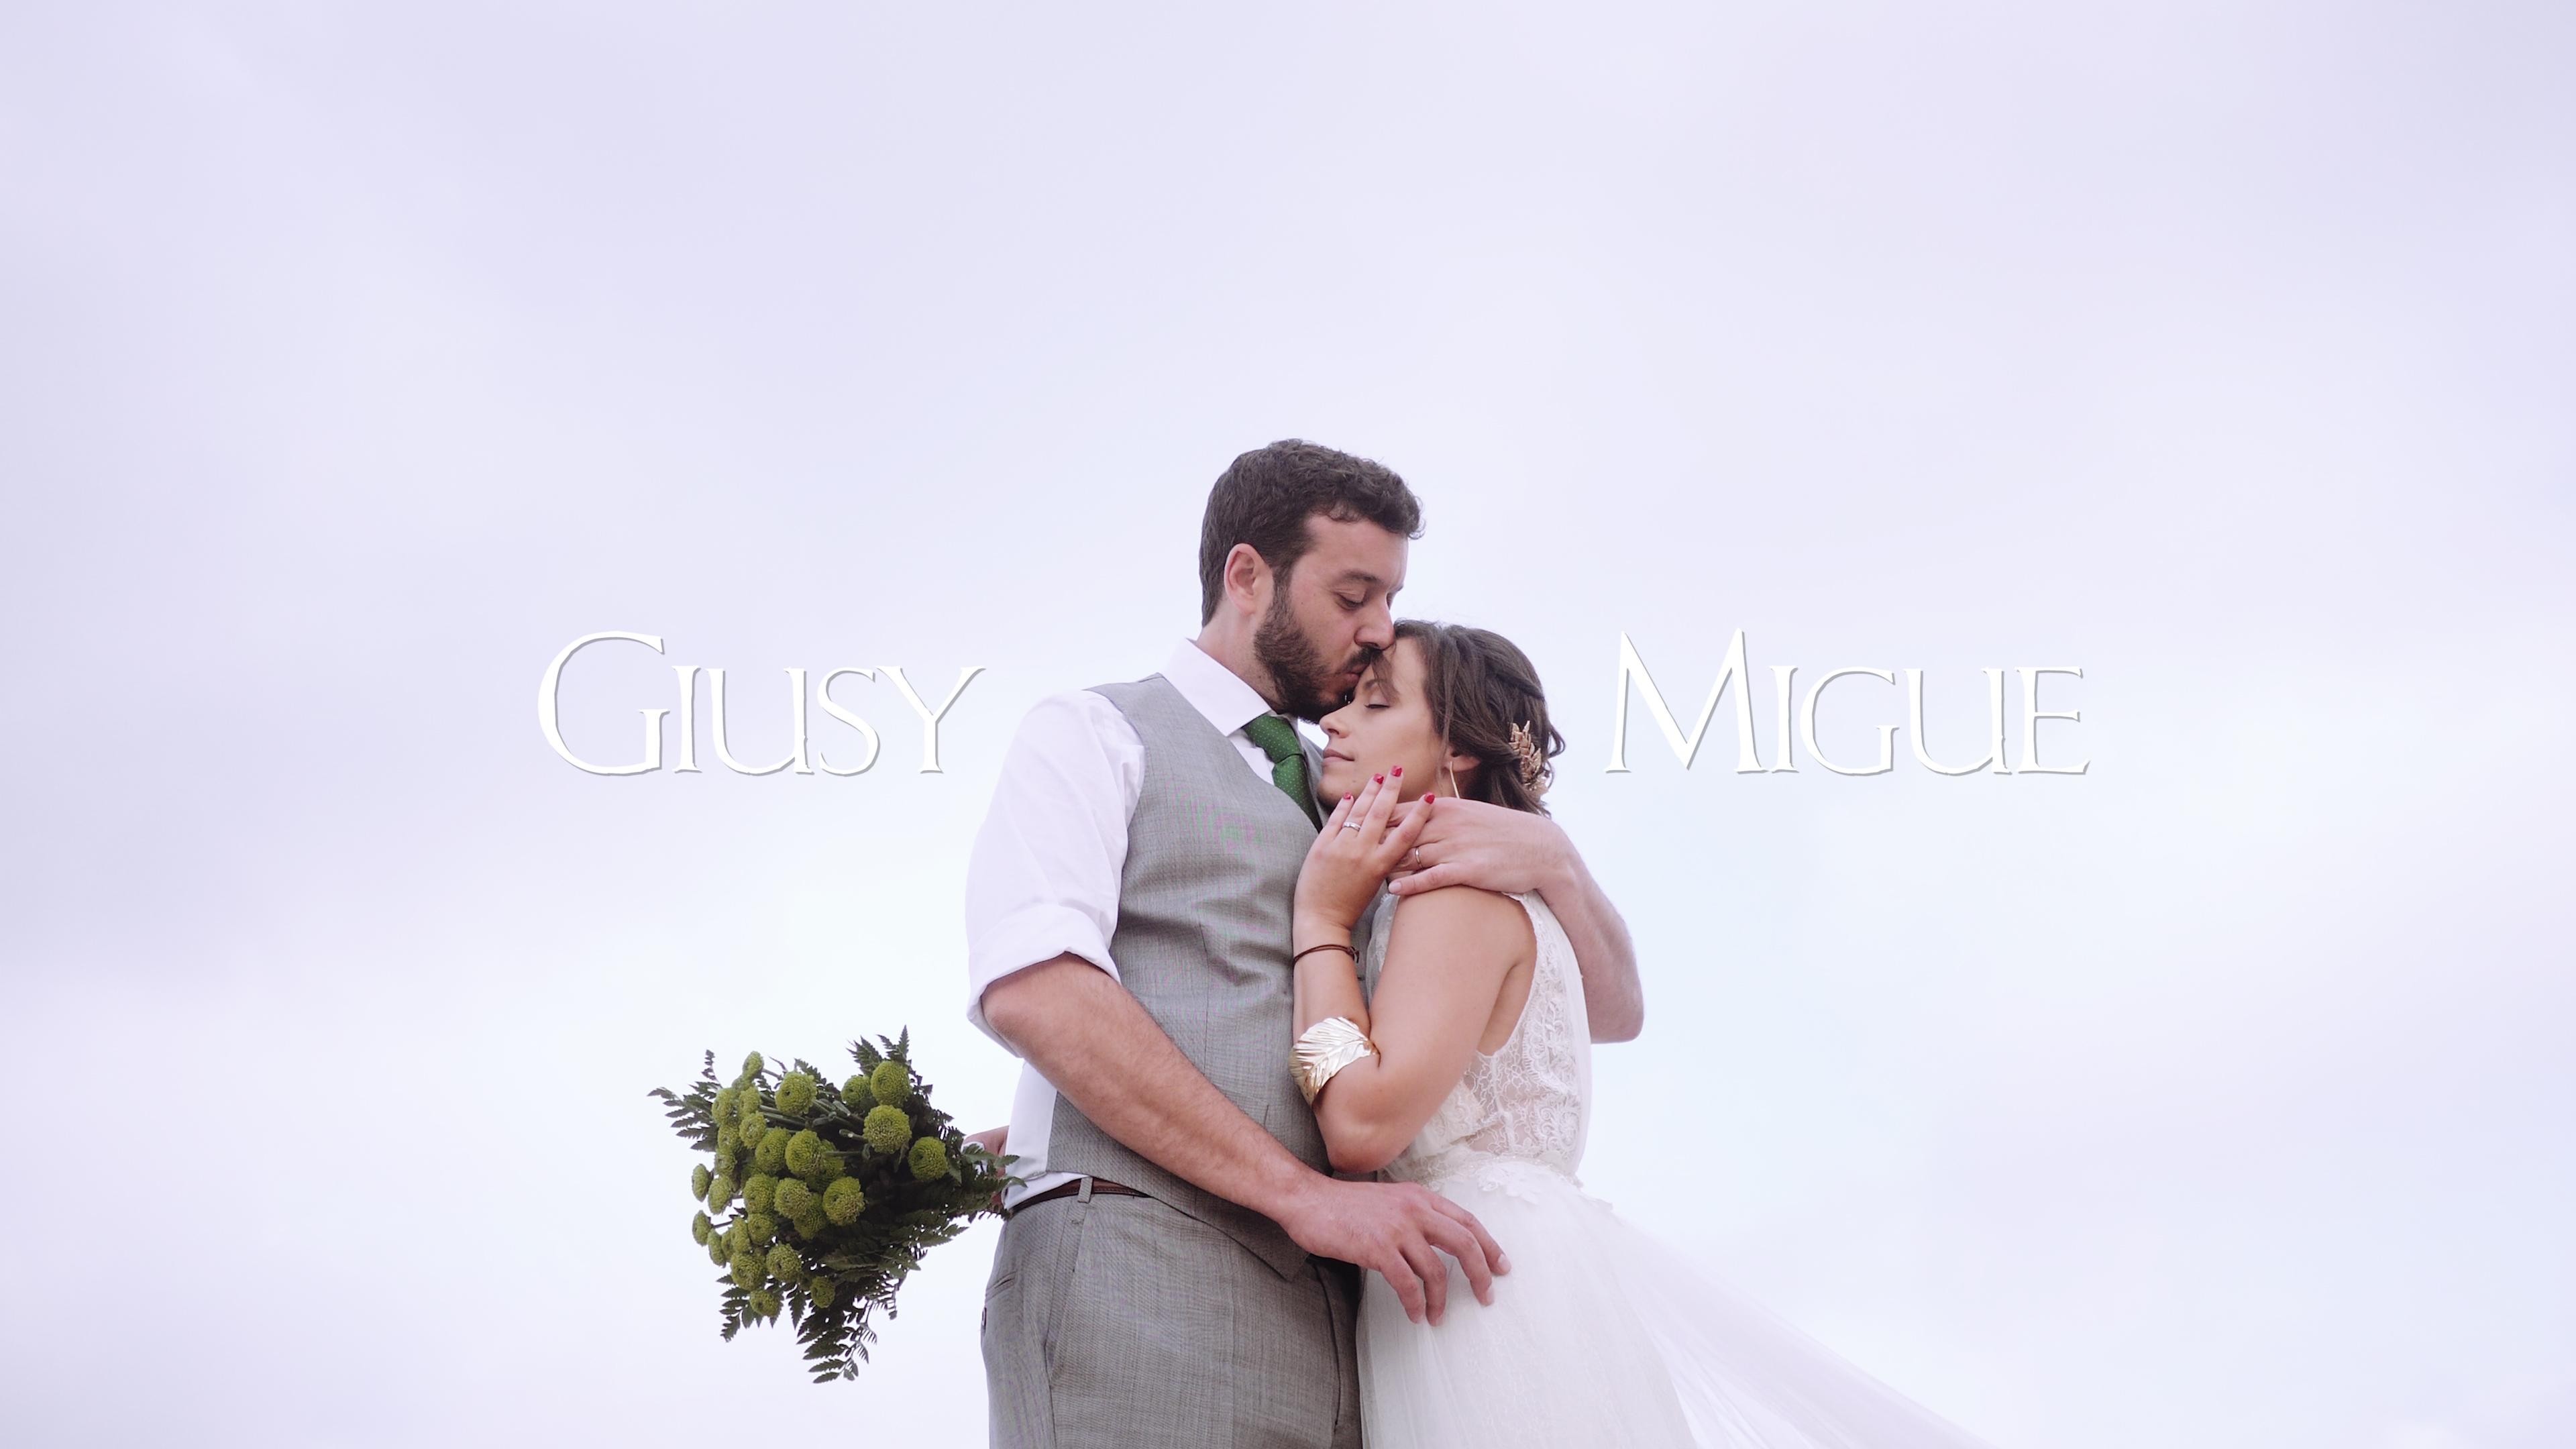 Giusy + Miguel | Tarragona, Spain | a beach